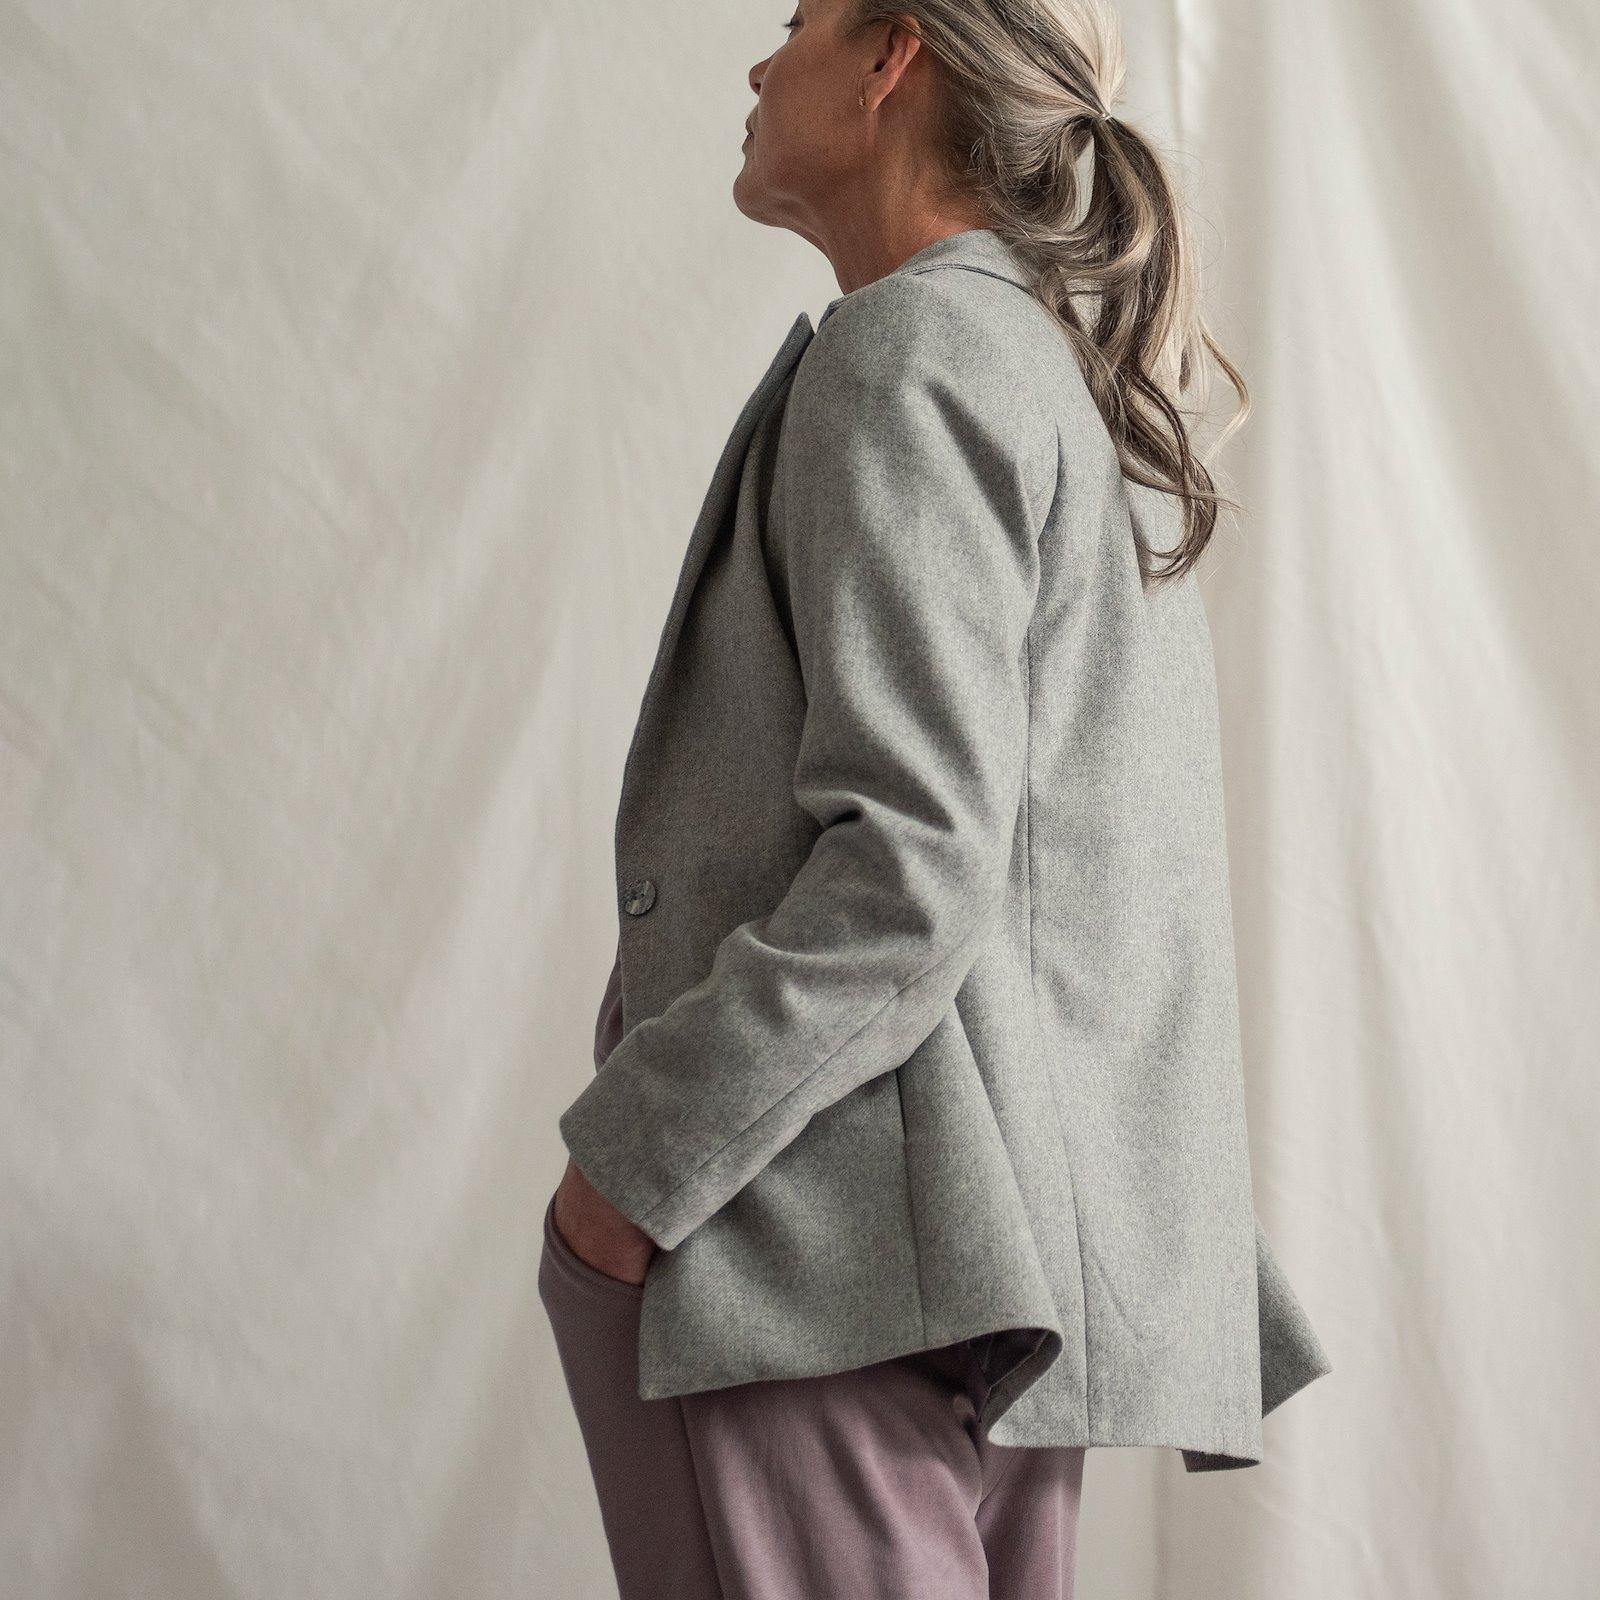 Cargo trousers, 34/6 p24048_300226_p20054_211795_sskit